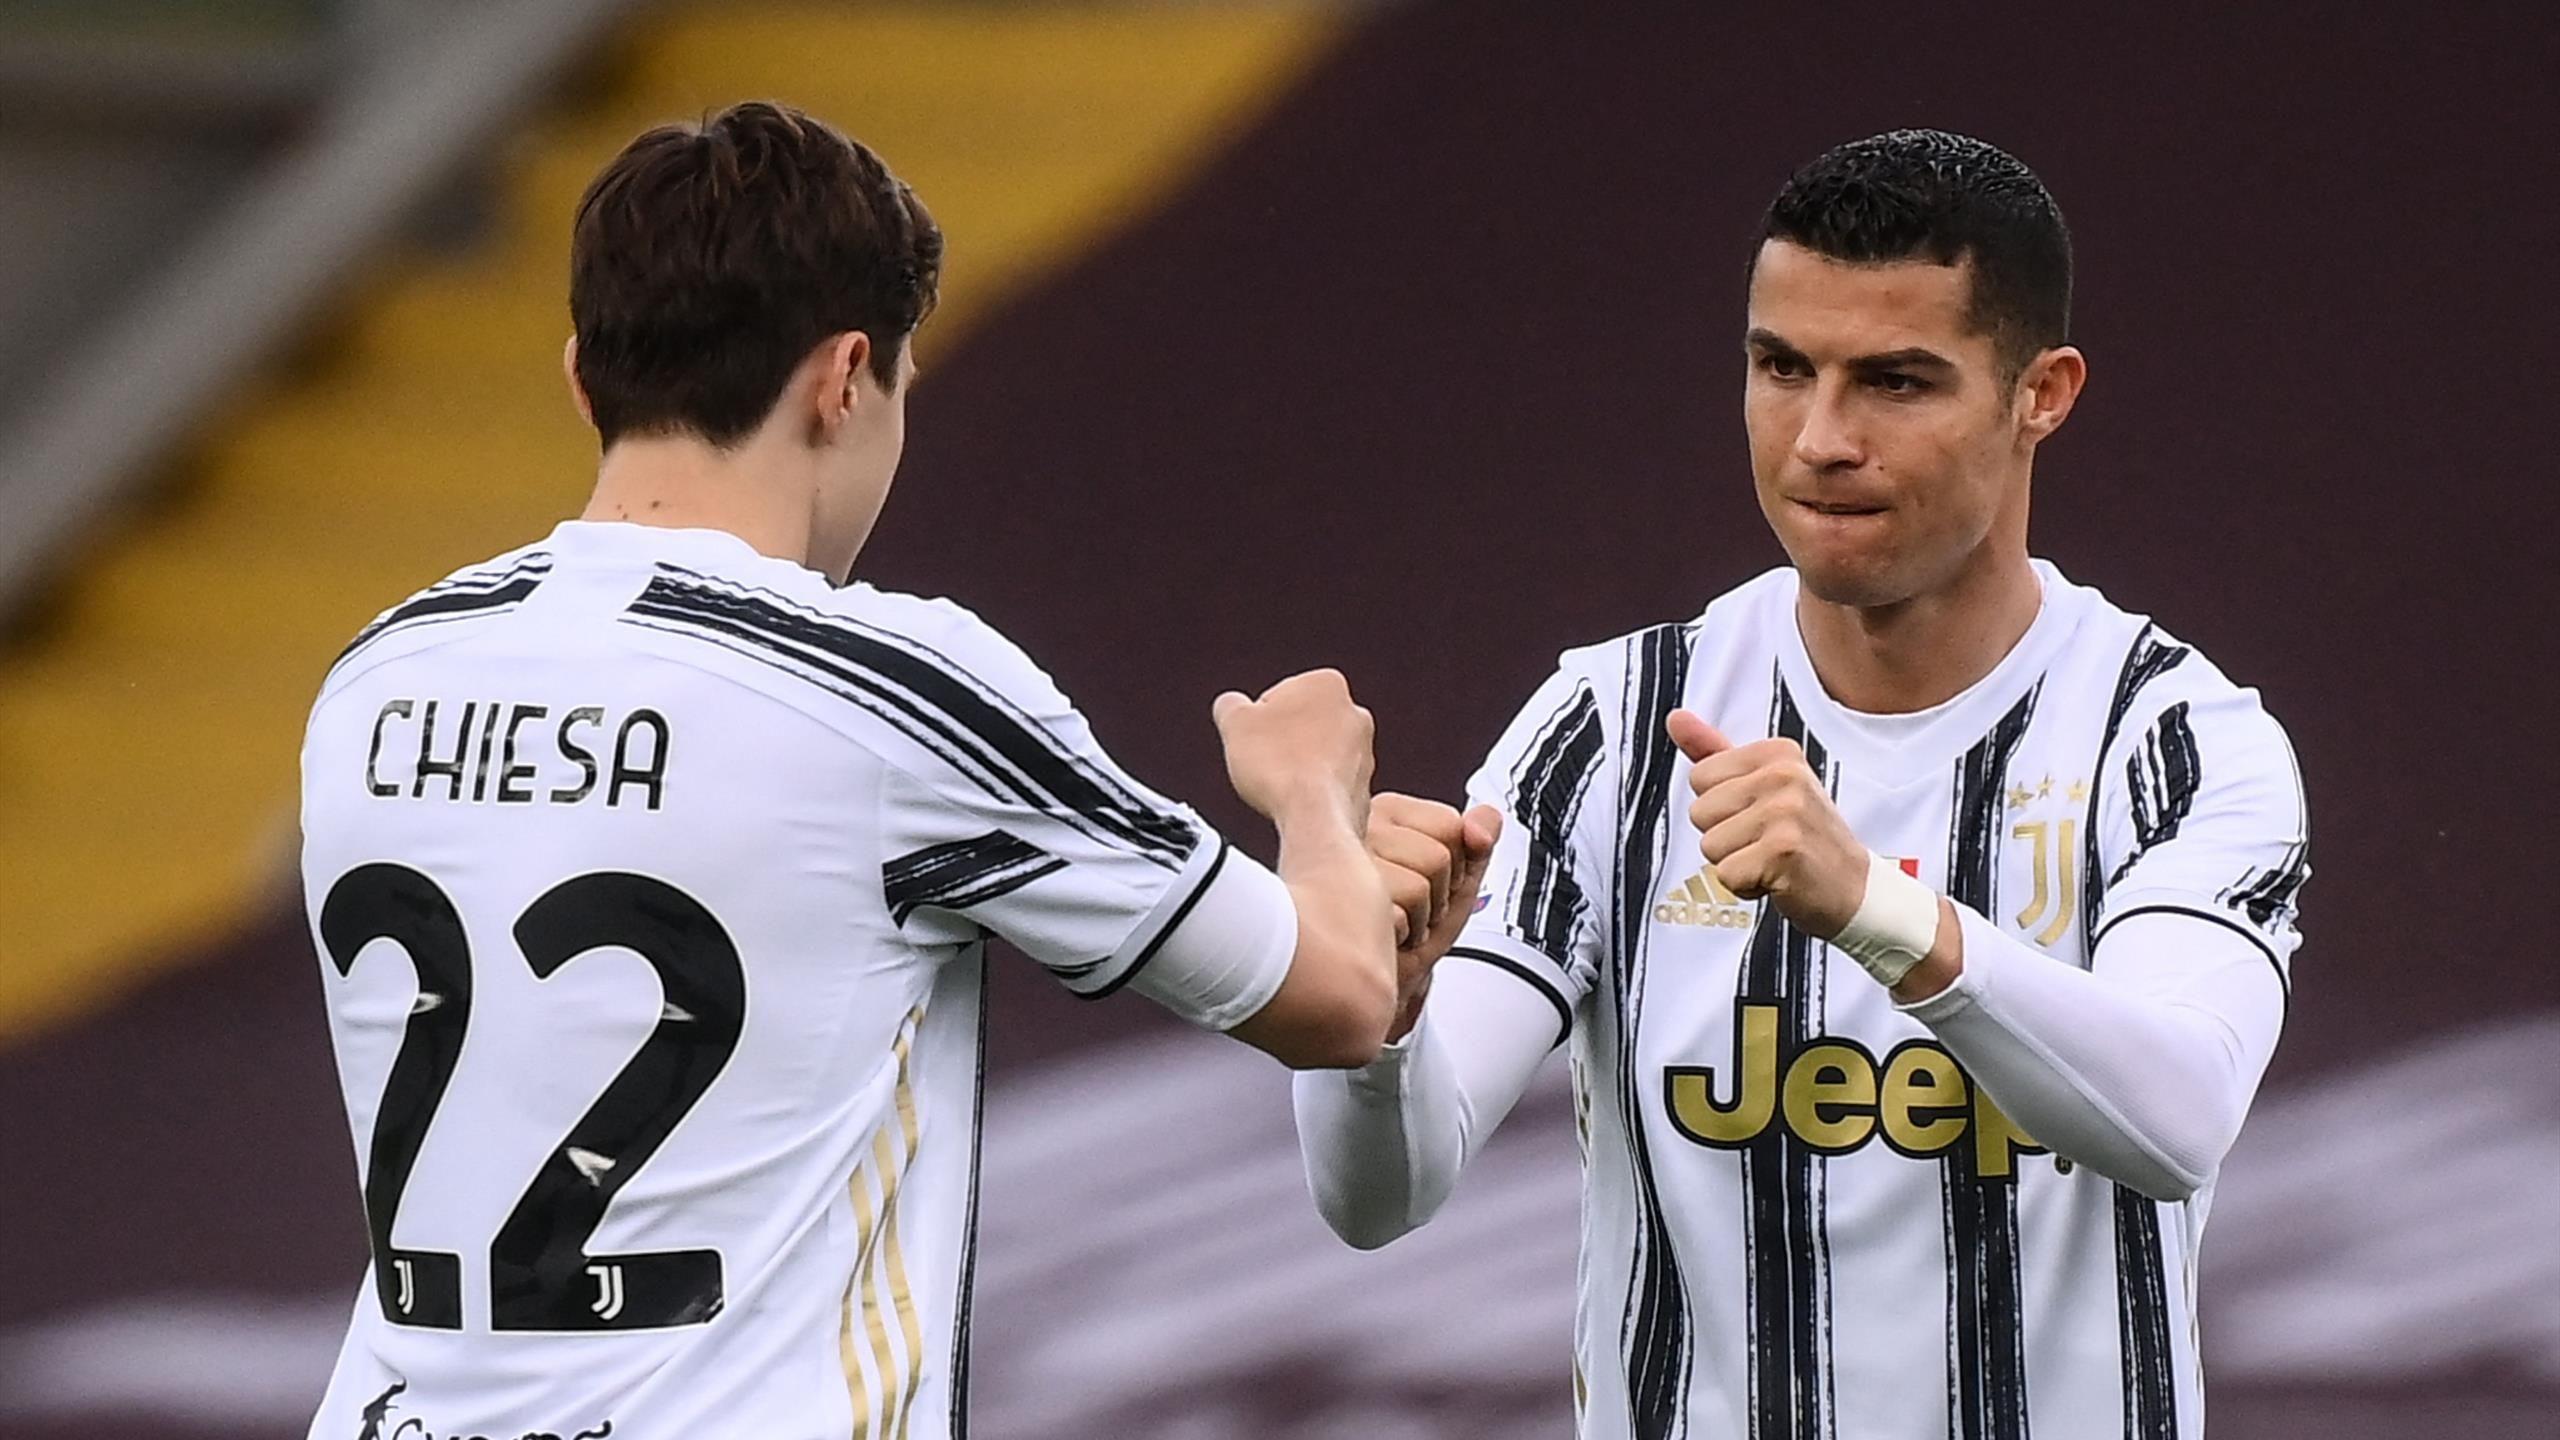 Juventus should build around Federico Chiesa and move on from Cristiano  Ronaldo mistake - Eurosport